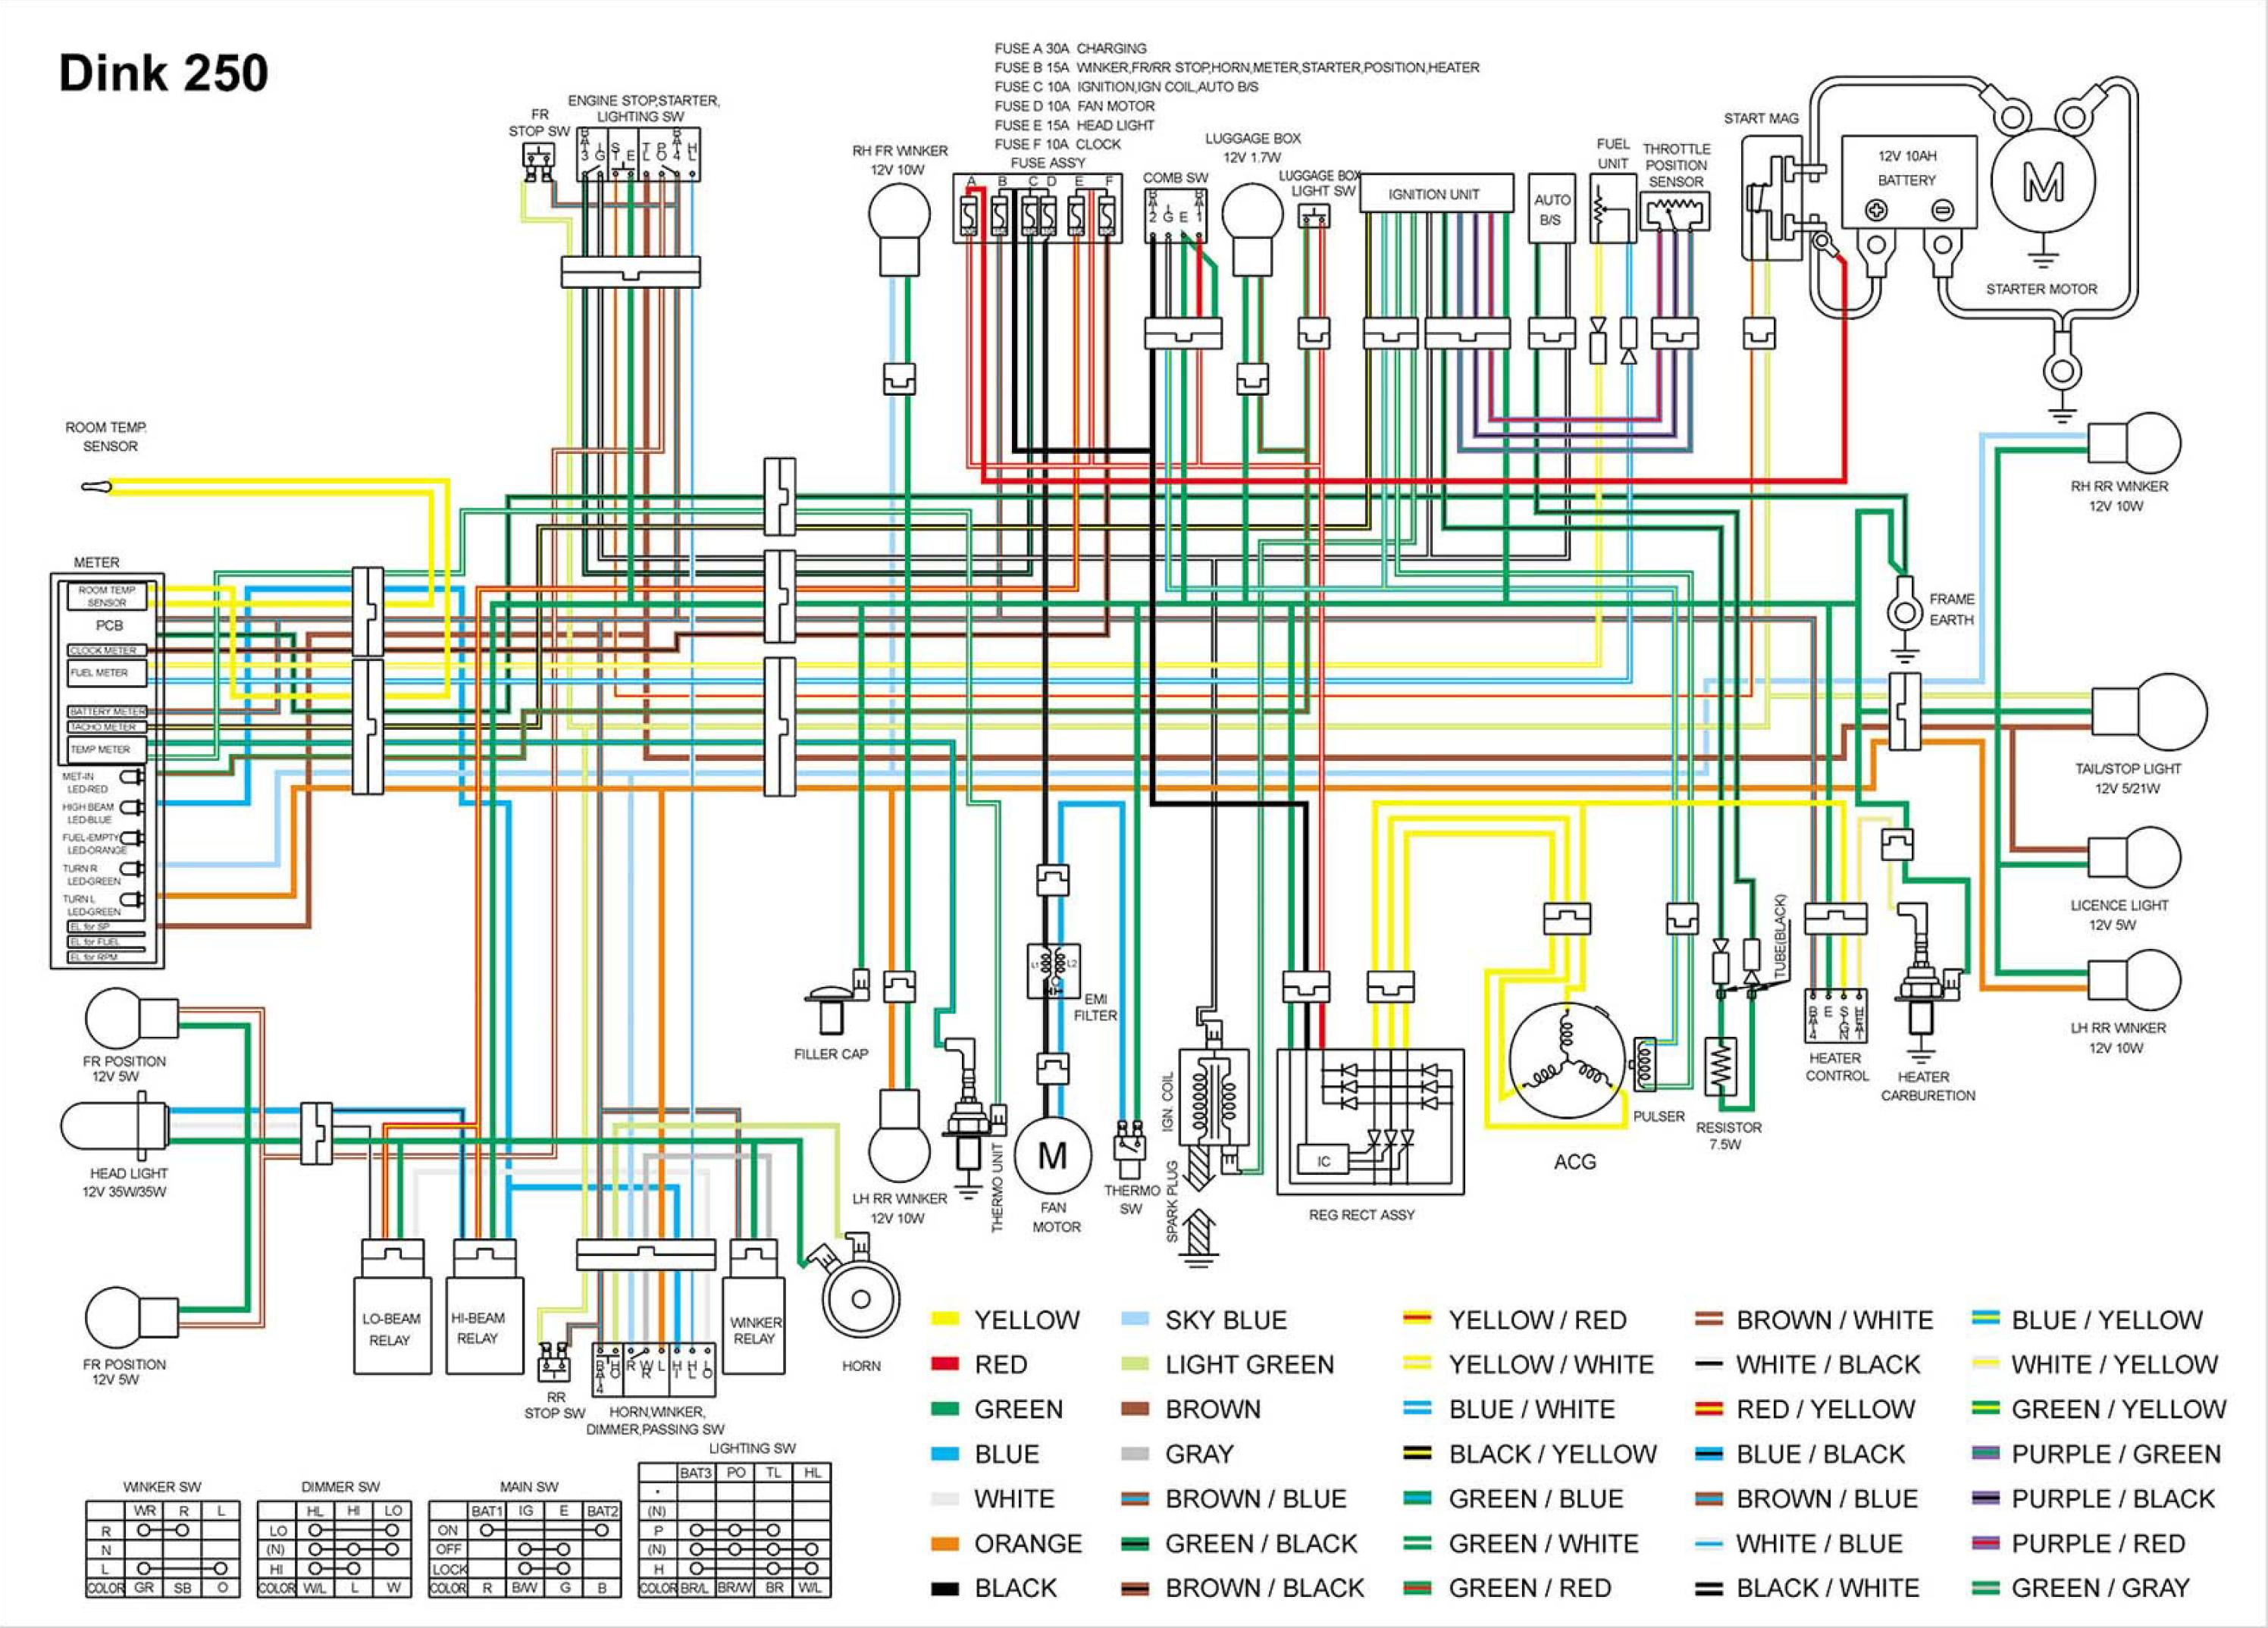 samsung sl 150 wiring diagram get free image about wiring diagram2007 cf moto 500 wiring diagram wiring diagram rh 35 asphalt community de